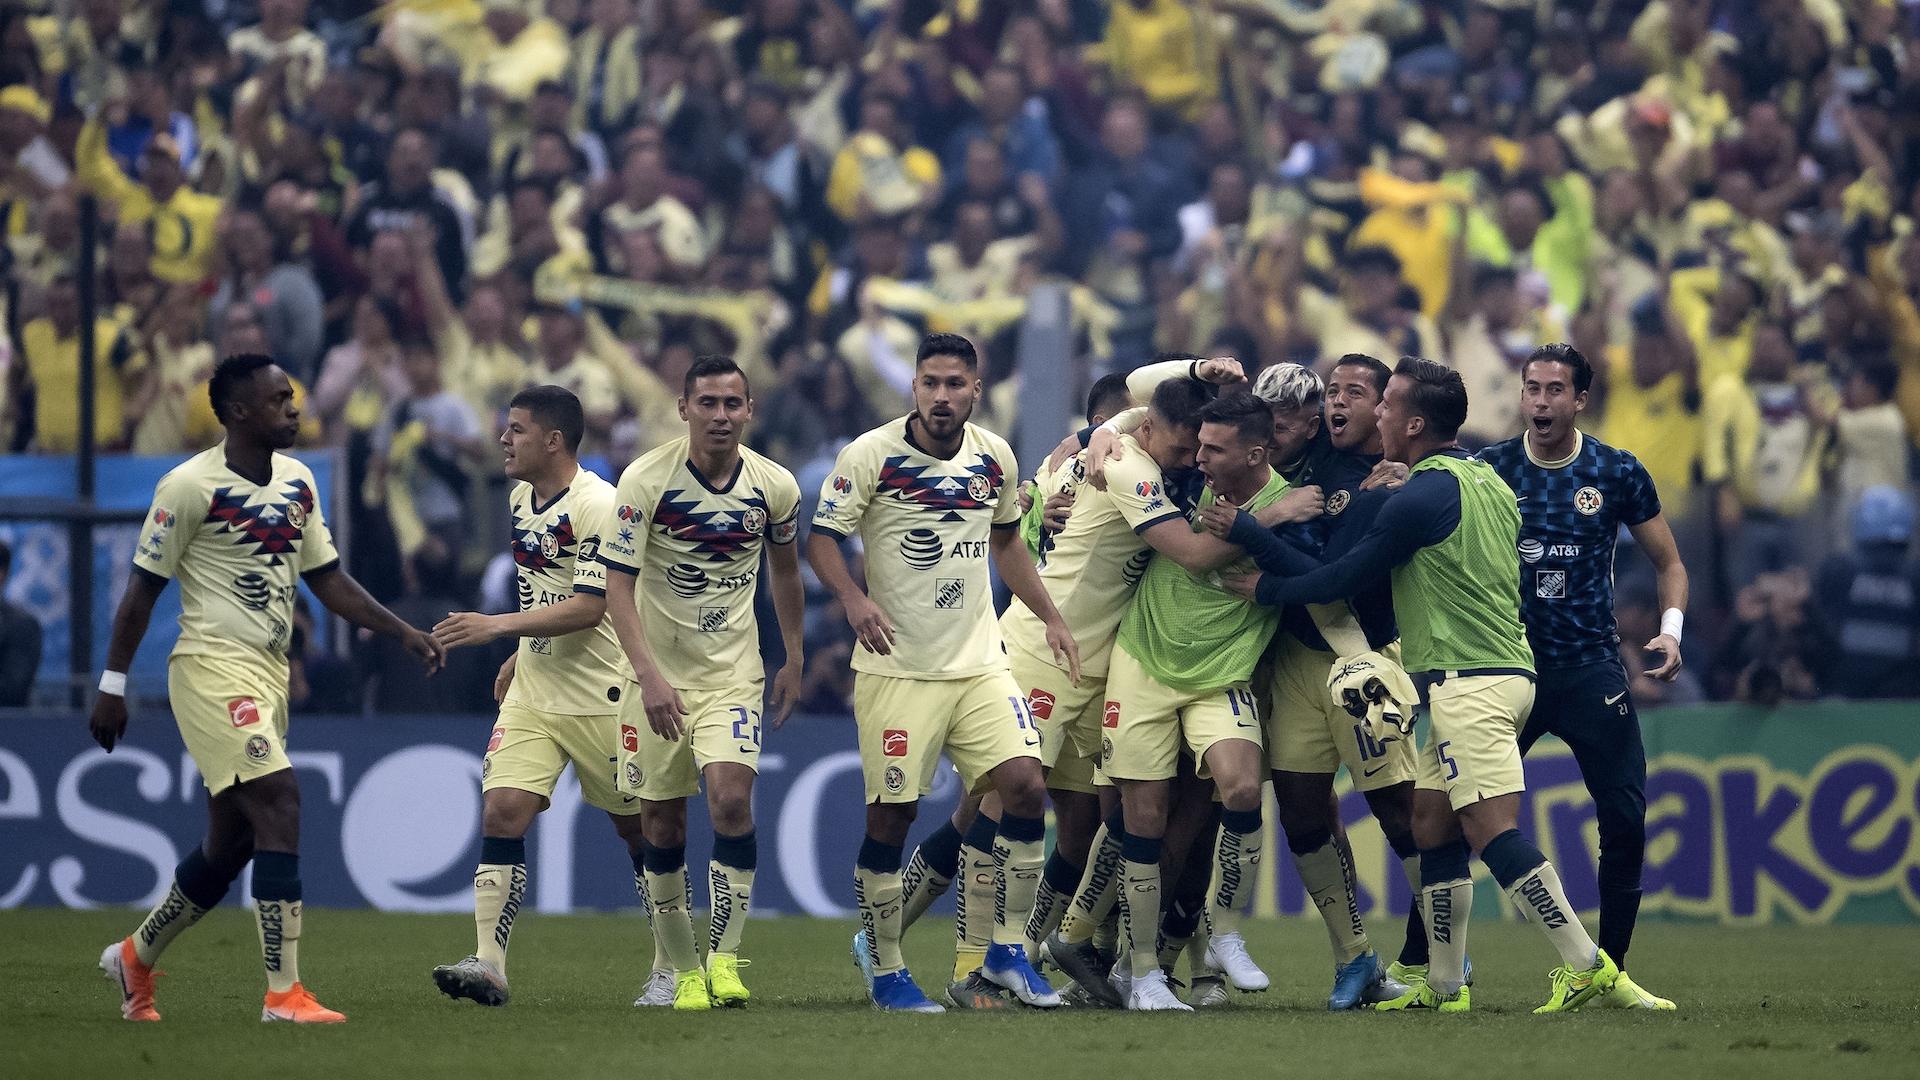 América festejando el gol de Viñas- Foto de Mexsport.